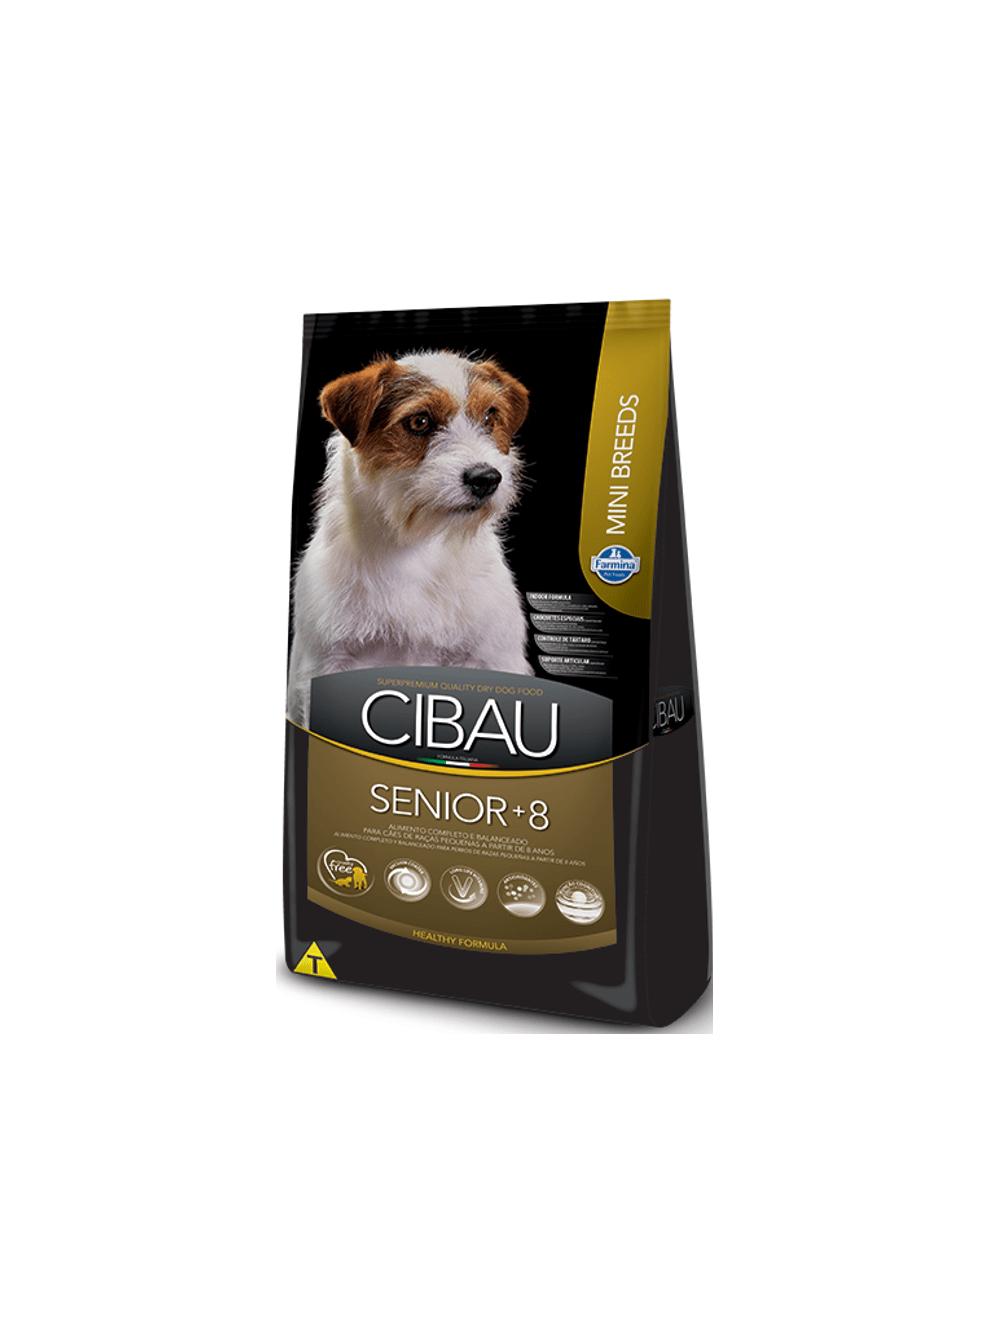 Comida Cibau Senior Mini Breed 3 Kg - Ciudaddemascotas.com